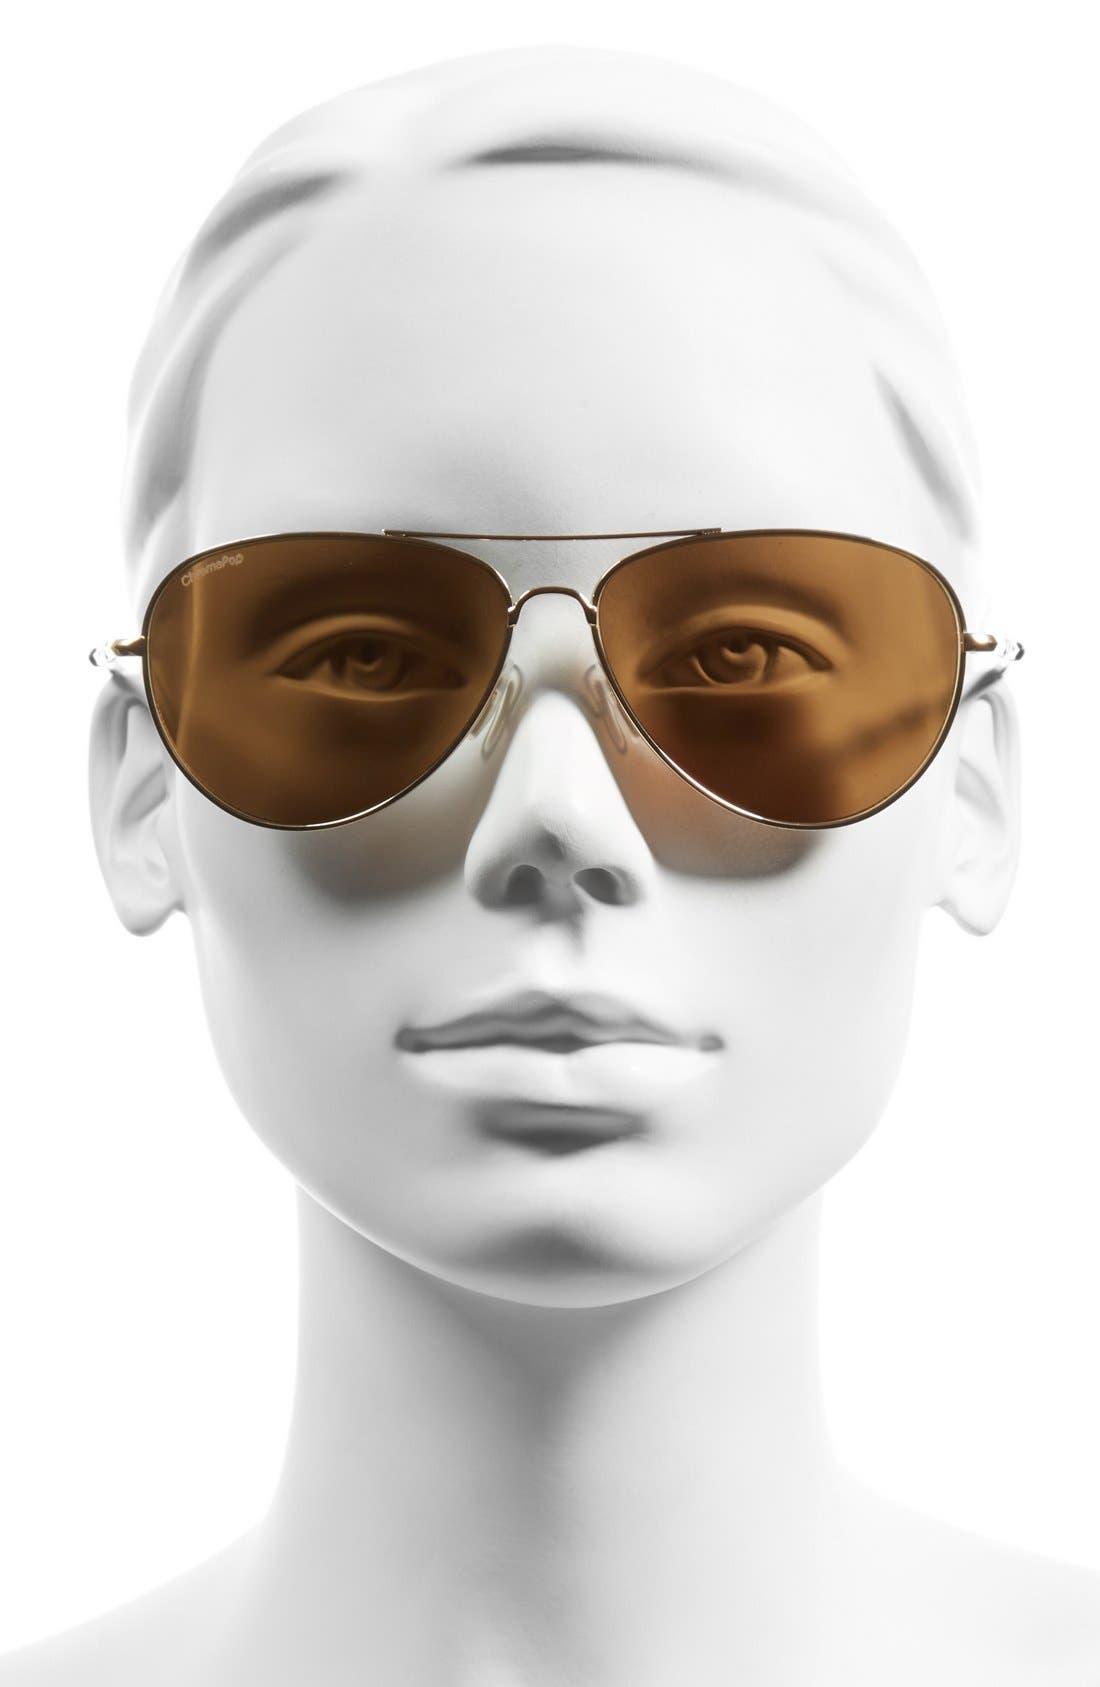 'Audible - ChromaPop' 60mm Polarized Aviator Sunglasses,                             Alternate thumbnail 2, color,                             Gold/ Polar Bronze Mirror